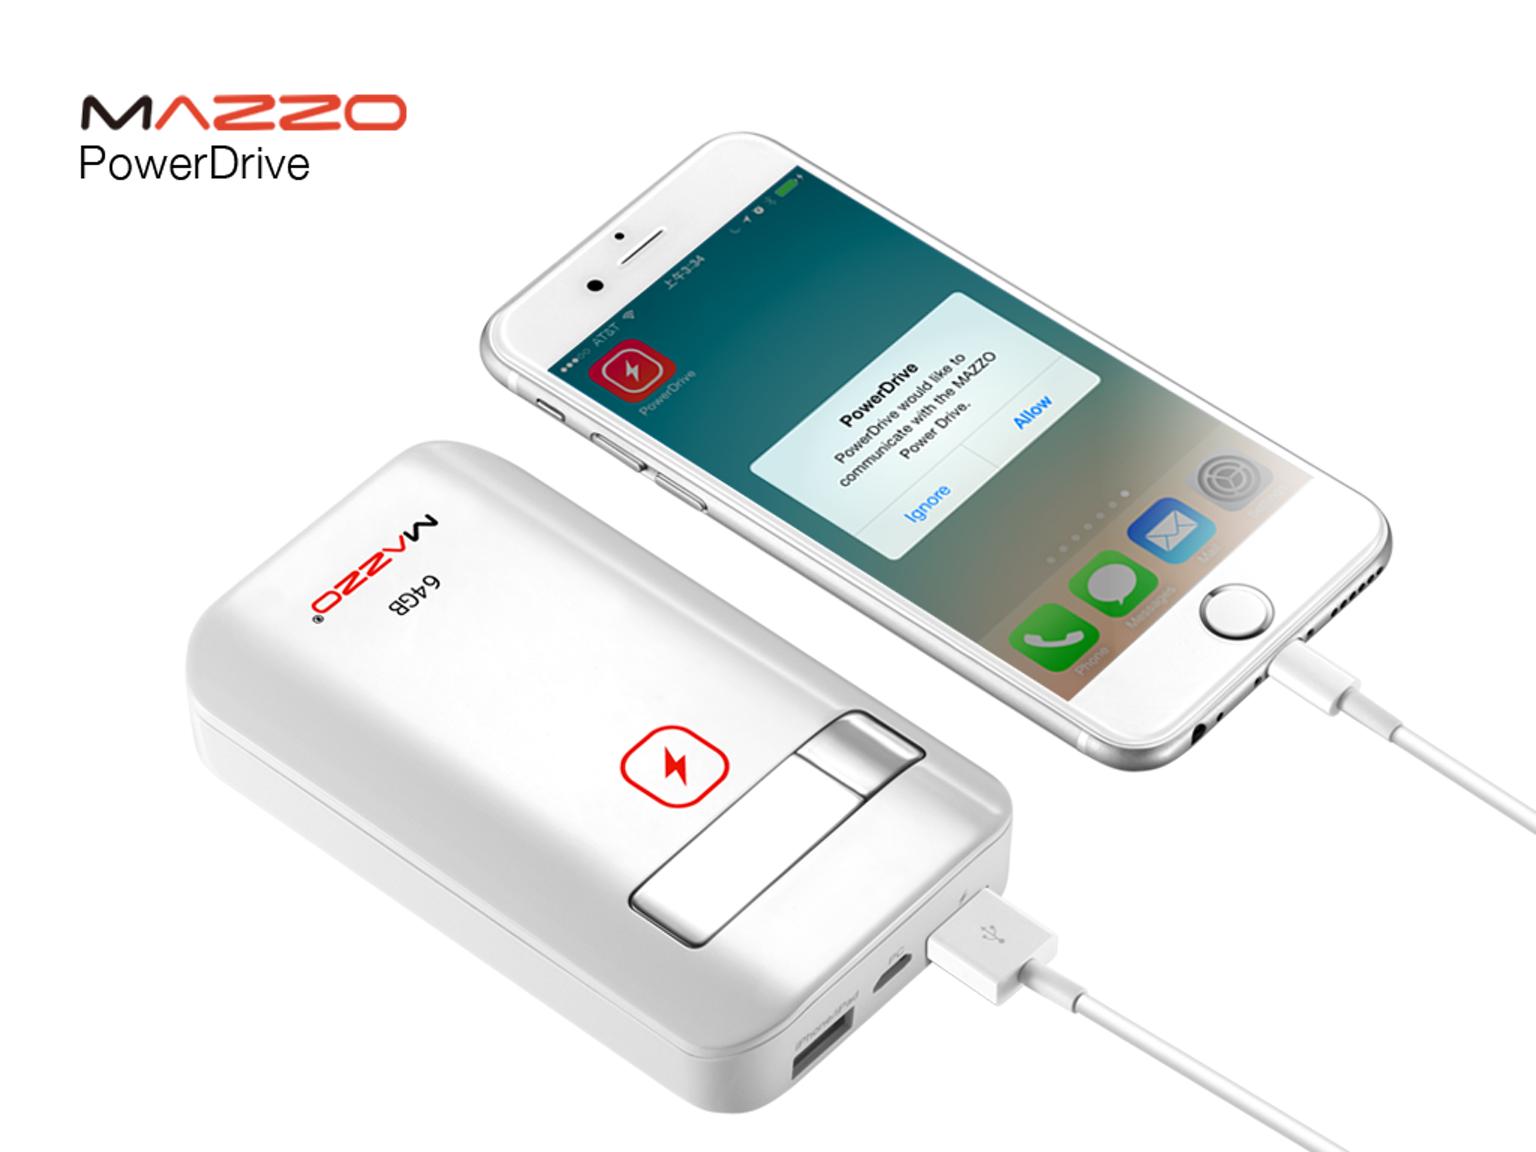 Mezzo PowerDrive — жесткий диск и внешний аккумулятор в одном девайсе